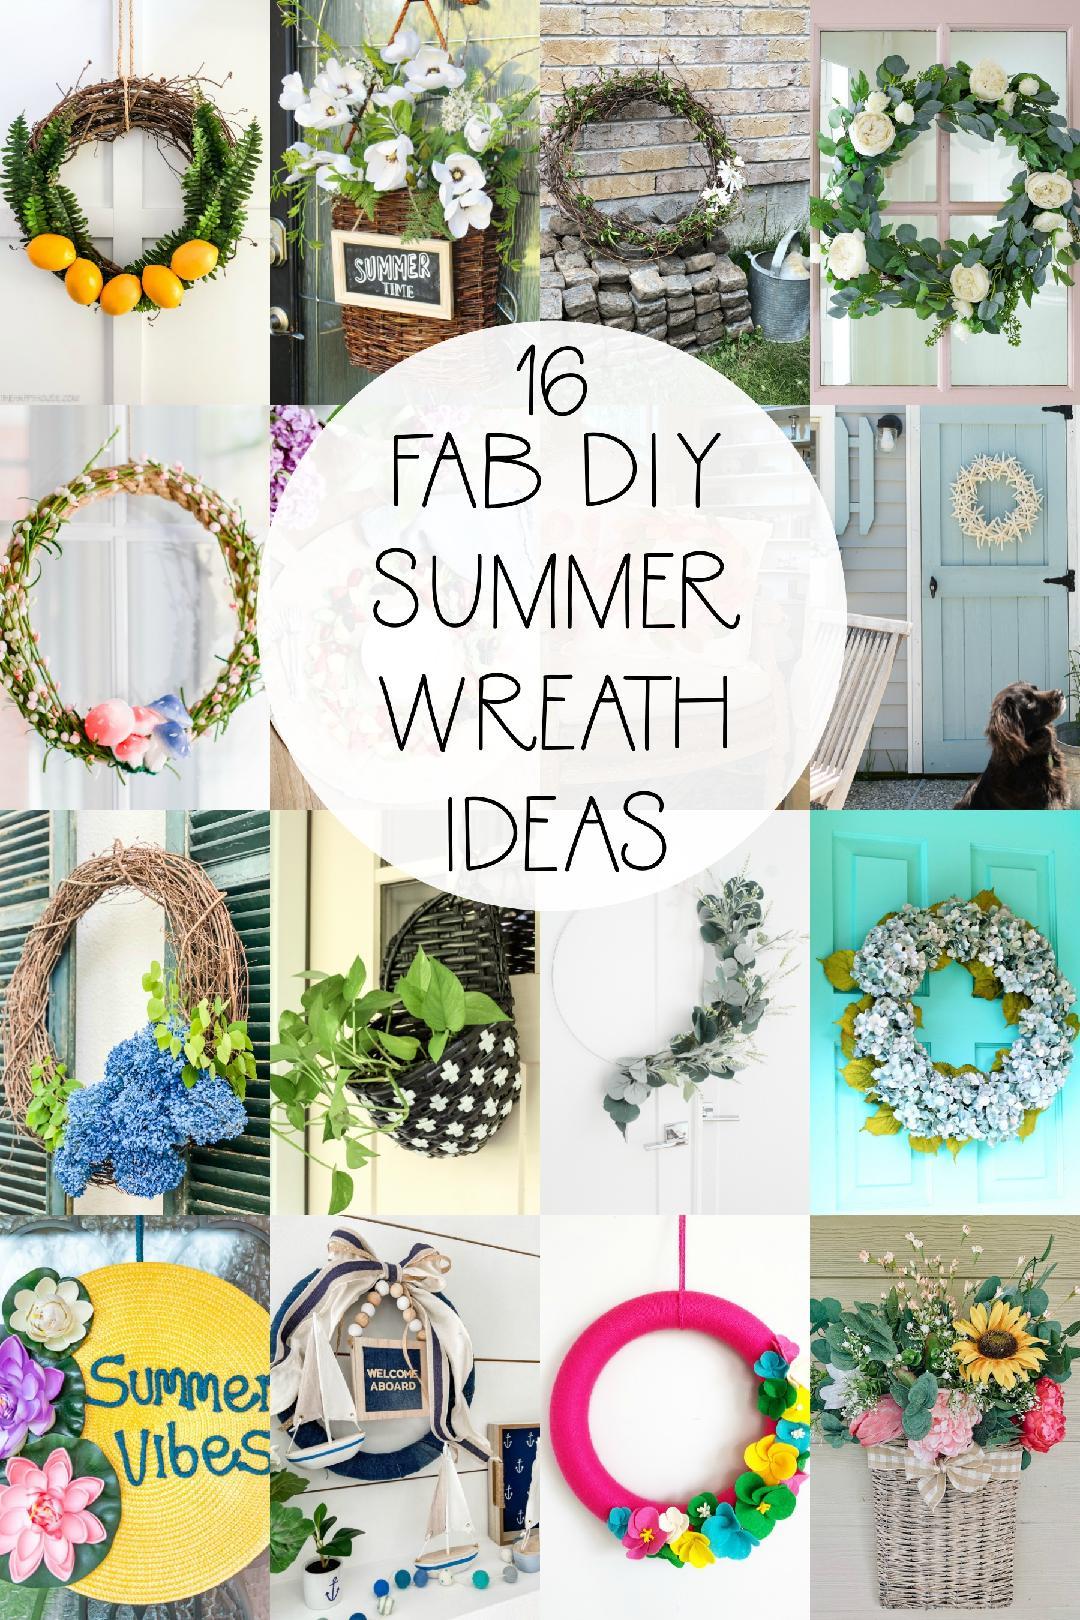 16 FAB DIY Summer Wreath Ideas to make now!